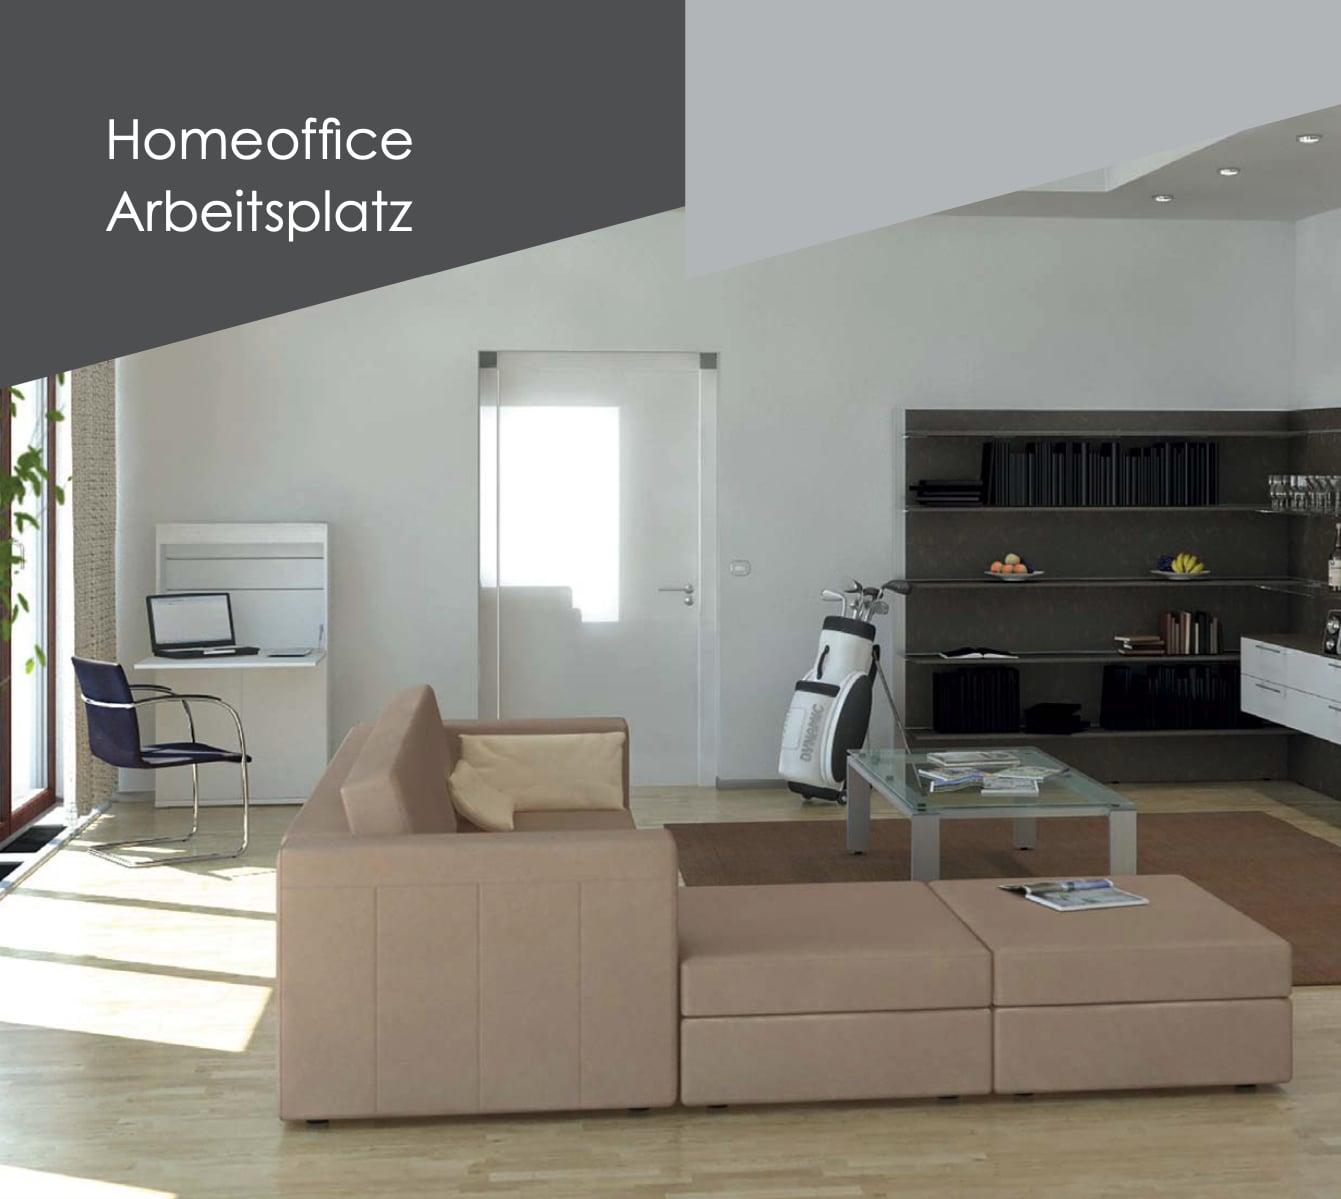 stock arbeitsplatz home office arbeitswelt 19